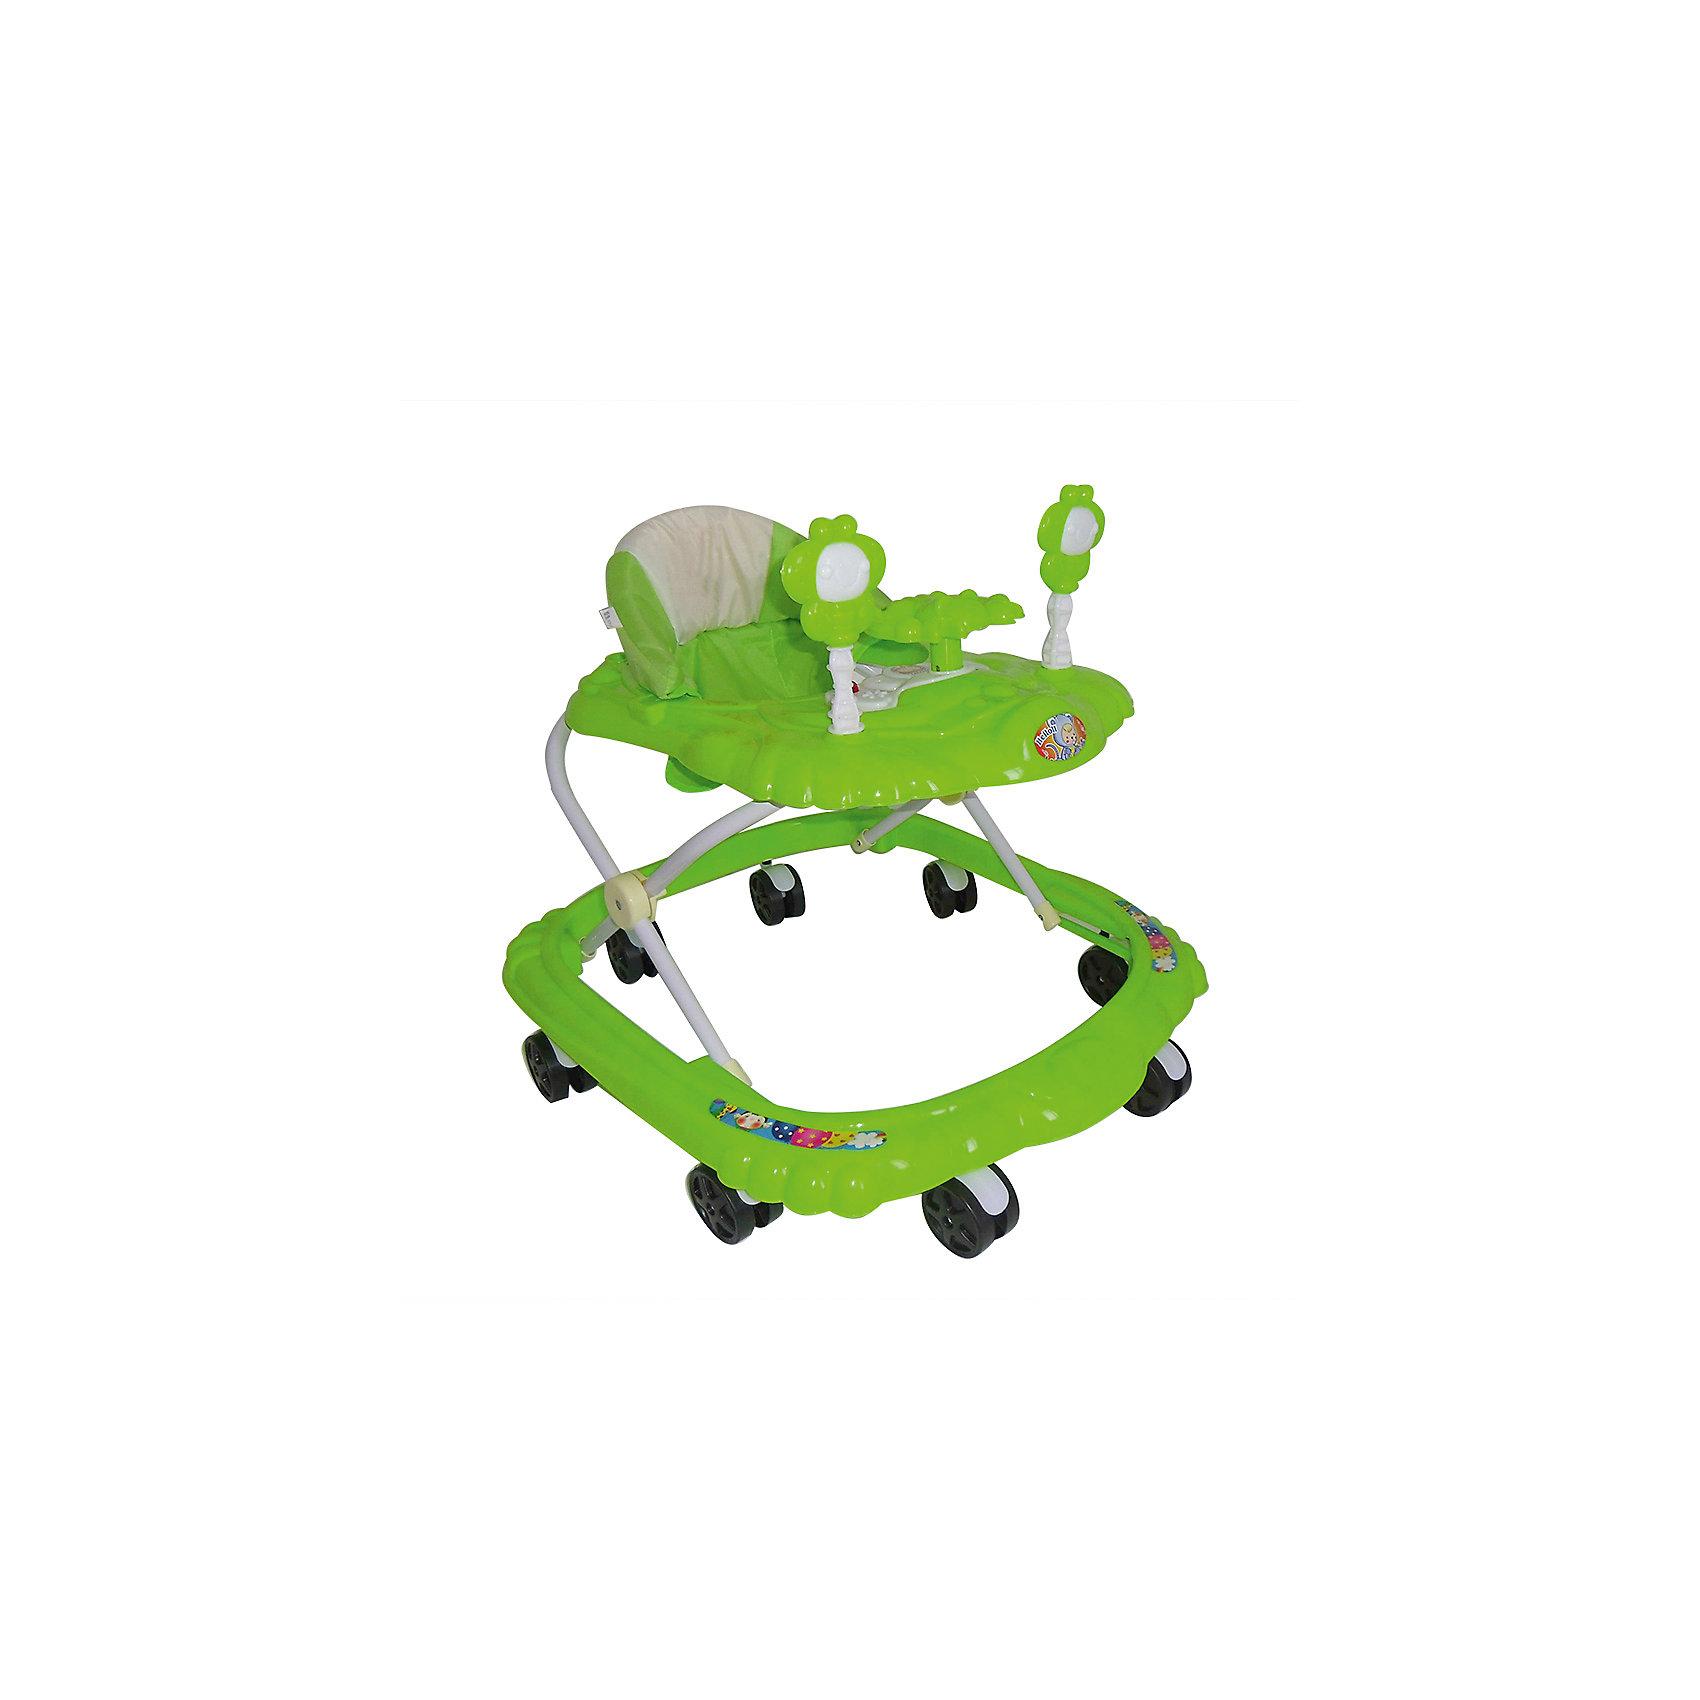 Ходунки Цветочки, Shine Ring, зеленыйХодунки<br>SHINE RING  Ходунки (8 колес,игрушки,муз) 6 шт в кор.(66*56*47), GREEN/ Зеленый<br><br>Ширина мм: 670<br>Глубина мм: 600<br>Высота мм: 520<br>Вес г: 3400<br>Возраст от месяцев: 6<br>Возраст до месяцев: 12<br>Пол: Унисекс<br>Возраст: Детский<br>SKU: 5559222